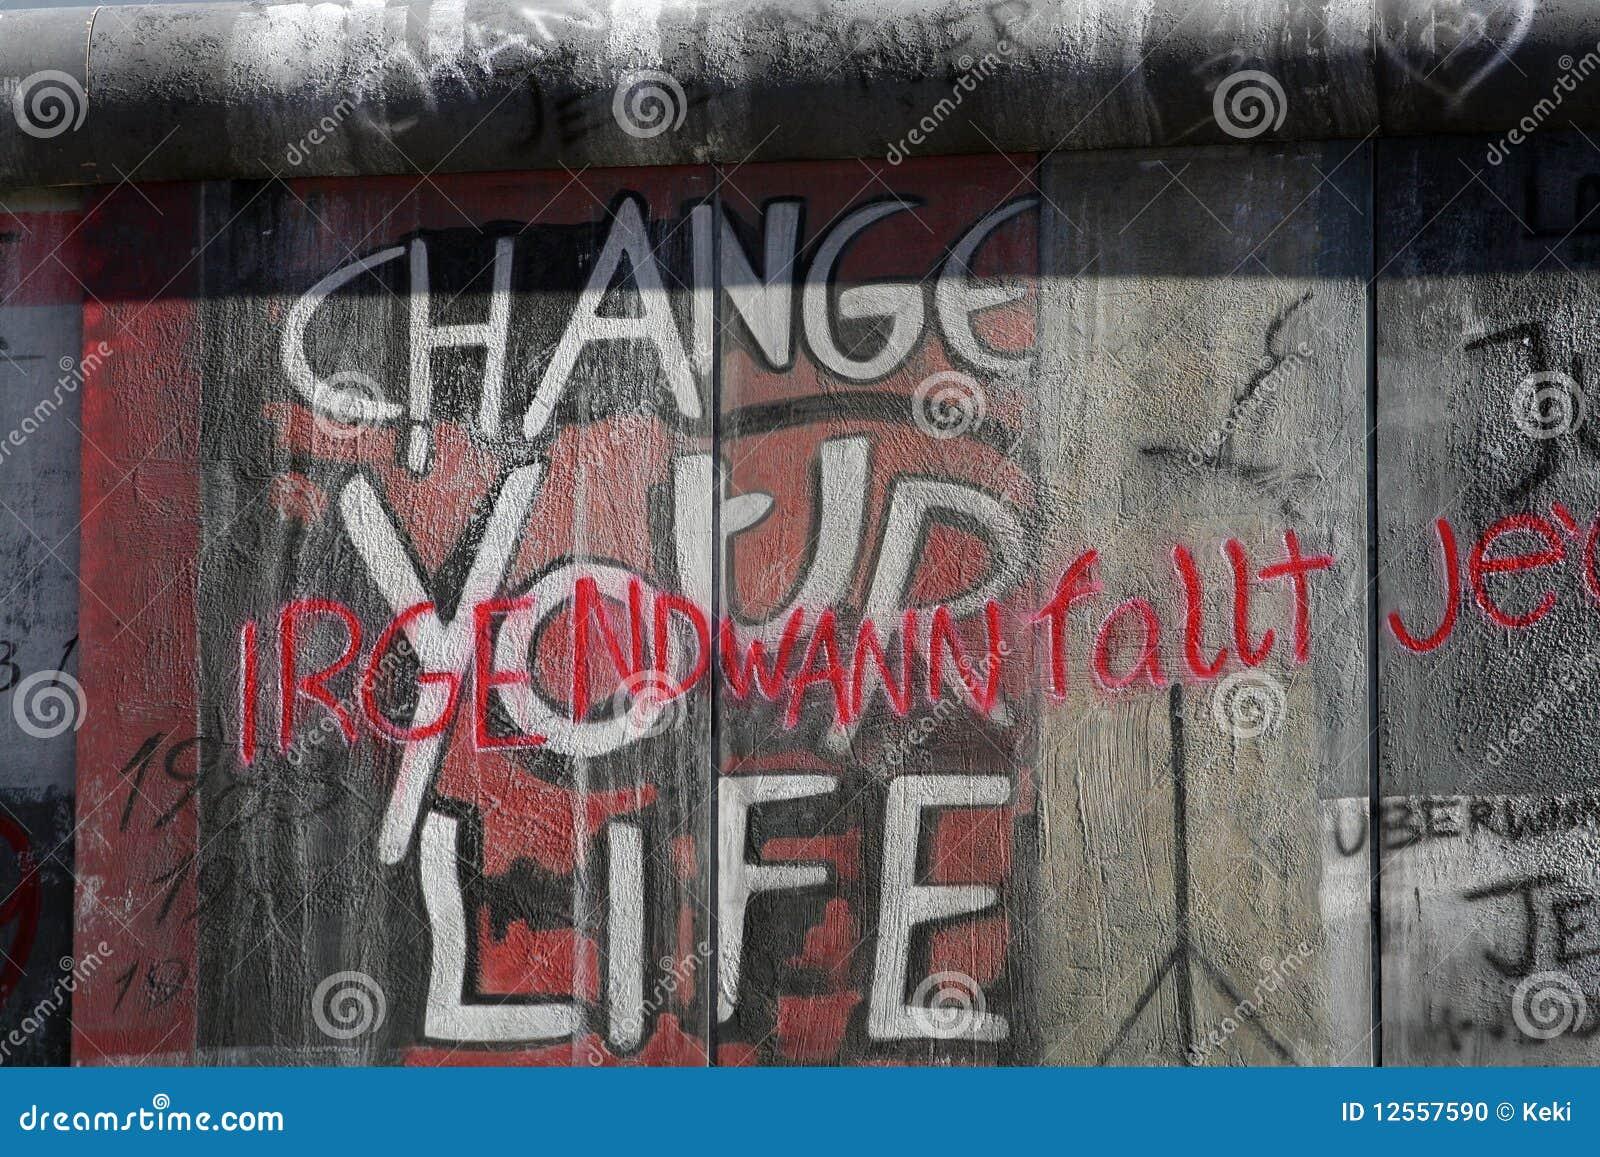 Your graffiti wall - Change Your Life Stock Photo Berlin Change Graffiti Life Wall